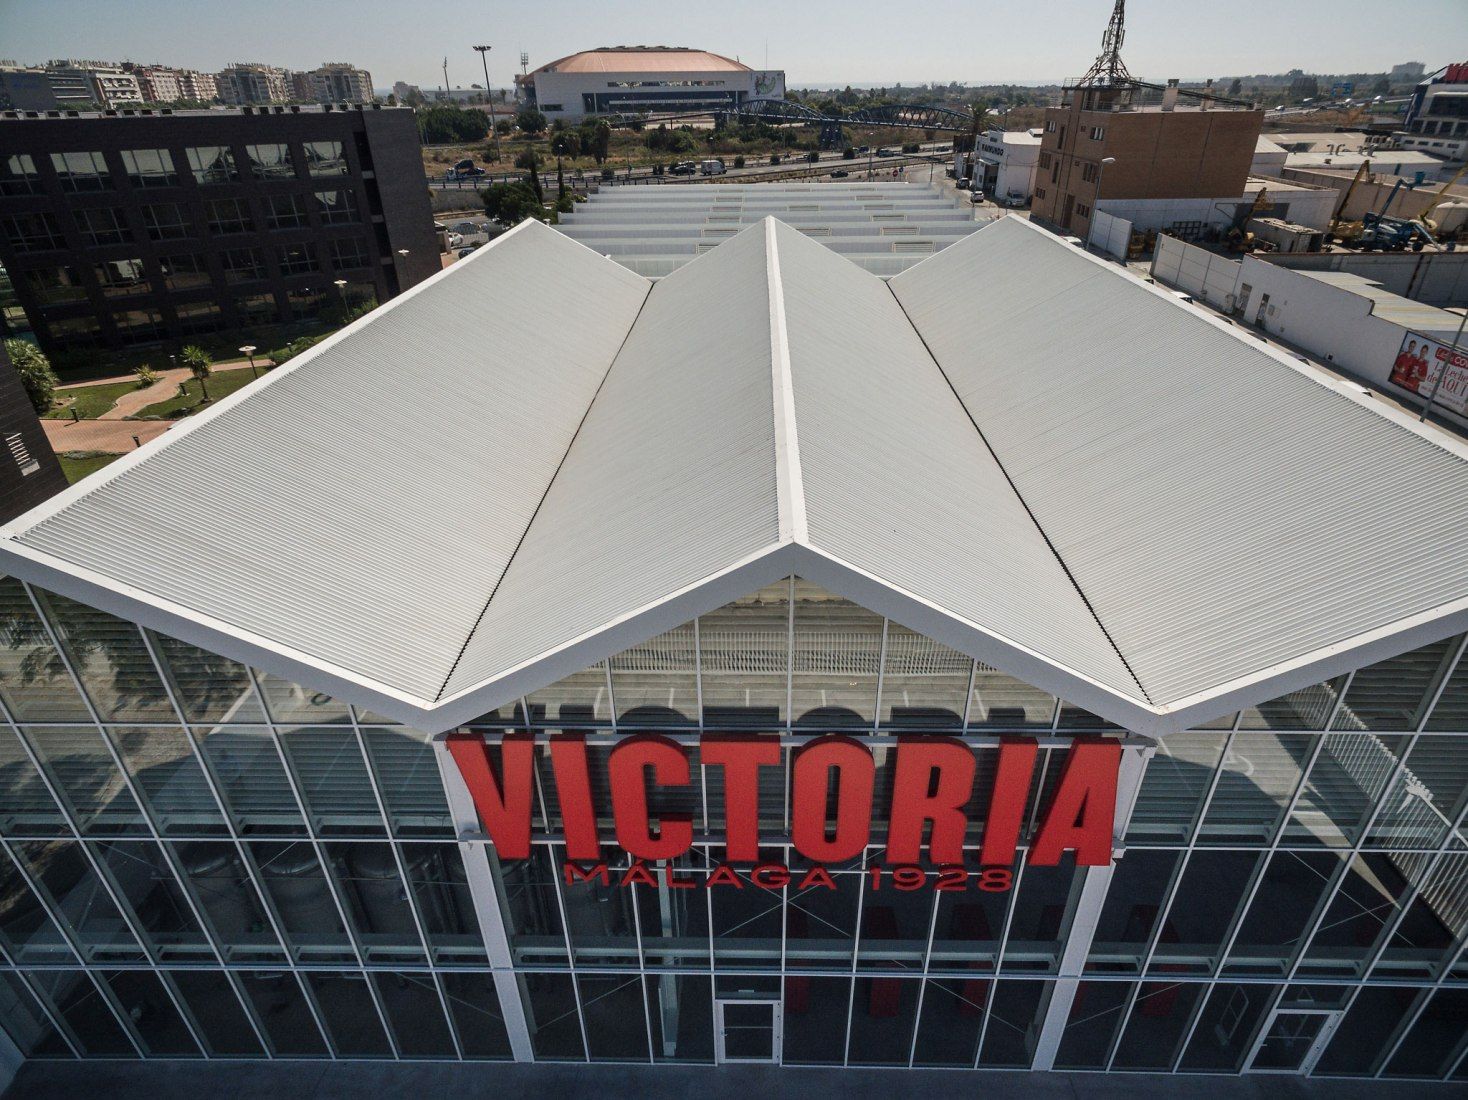 Aerial view. Victoria Beer Factory by GANA Arquitectura. Photograph © Fernando Alda